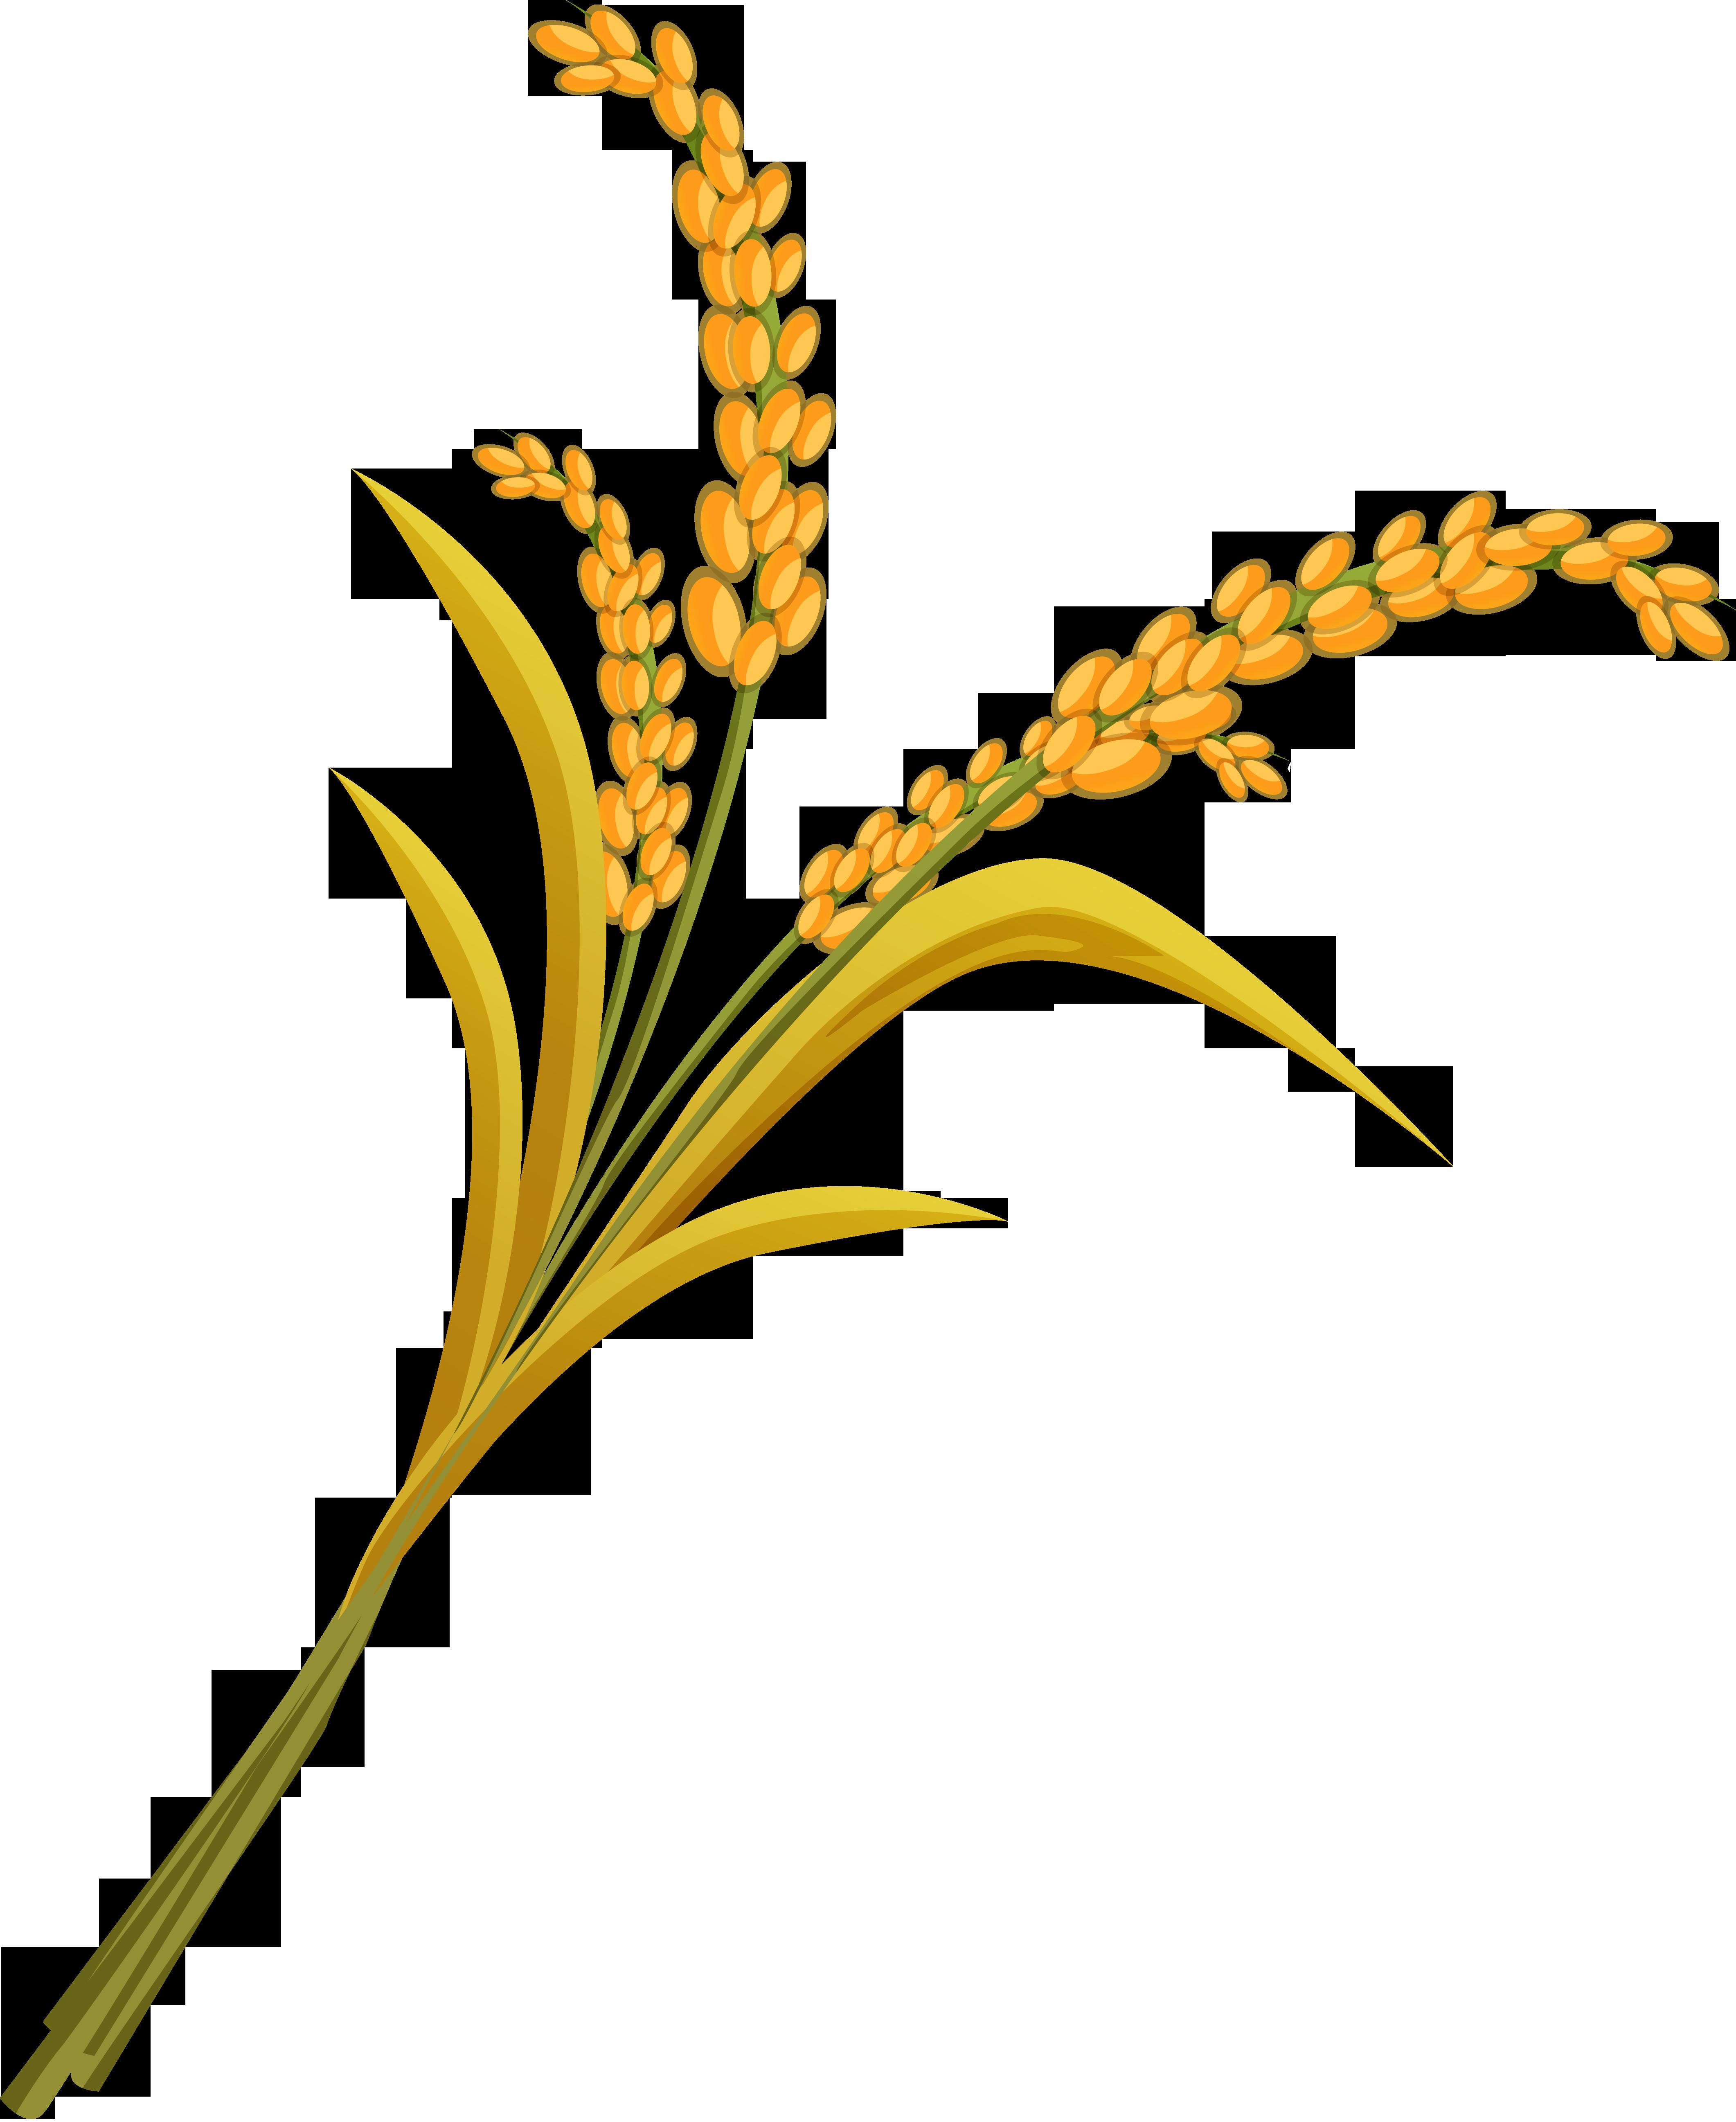 Wheat png image purepng. Grain clipart millet